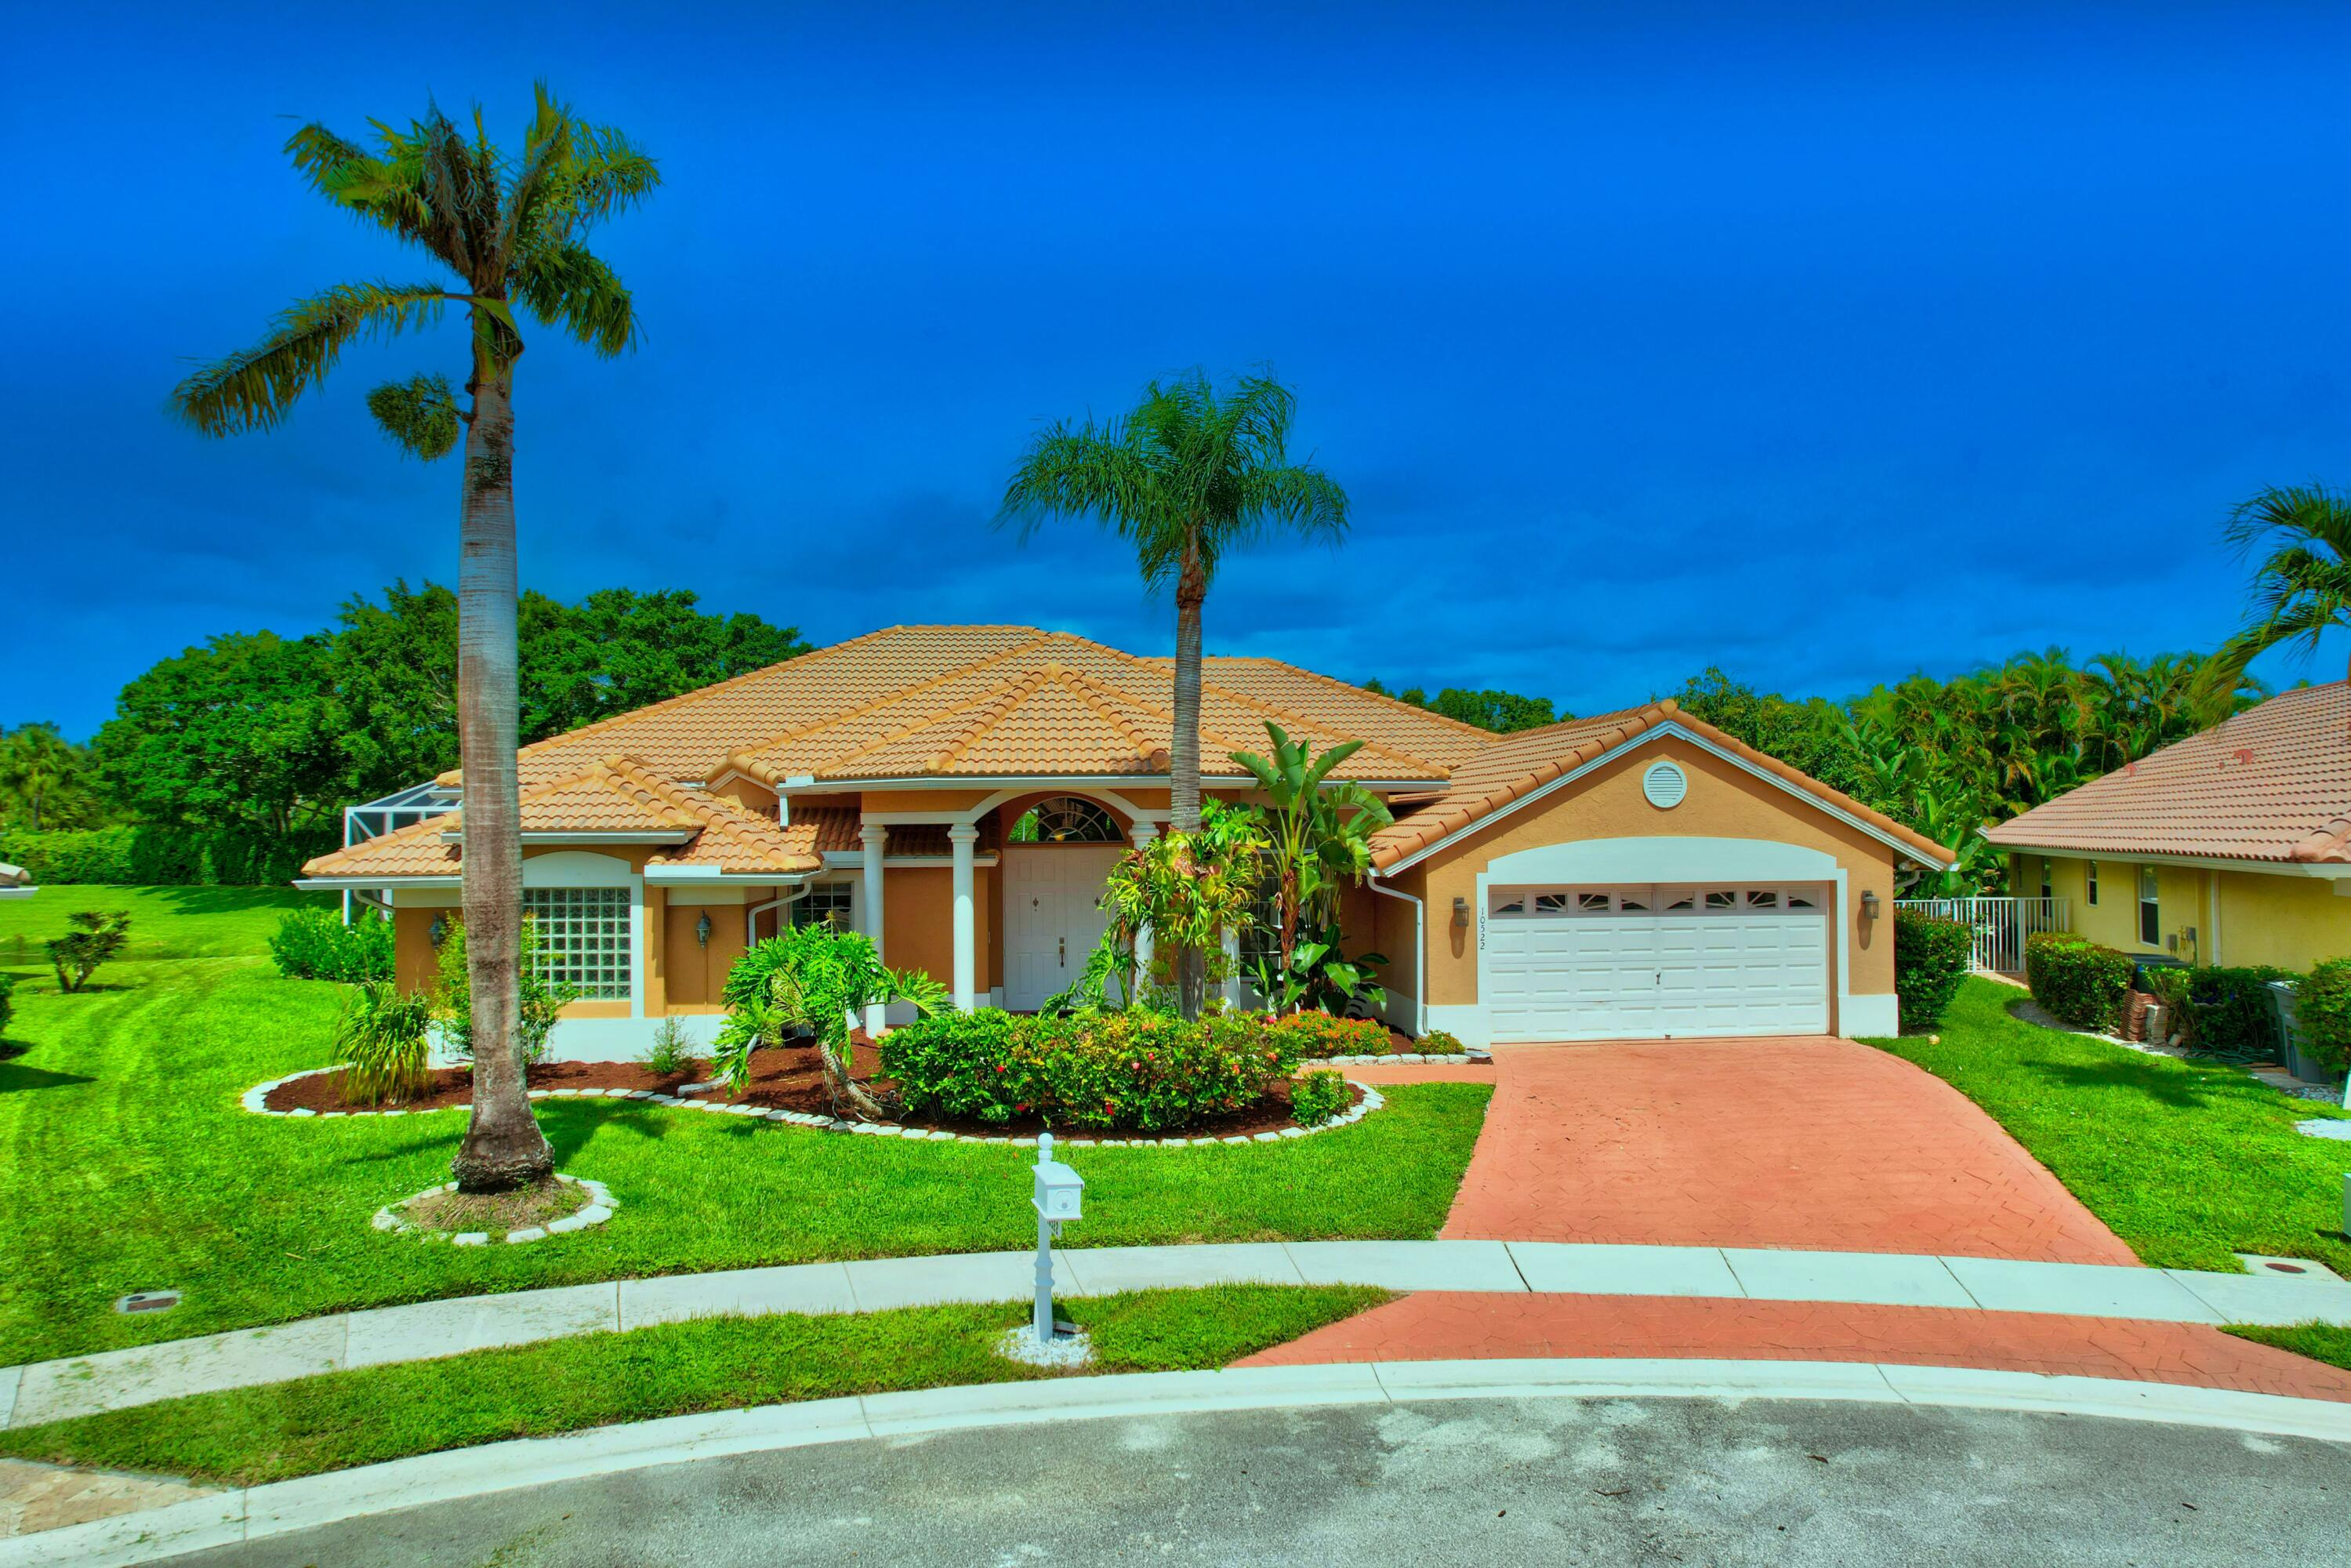 10522 Maple Chase Drive, Boca Raton, FL 33498